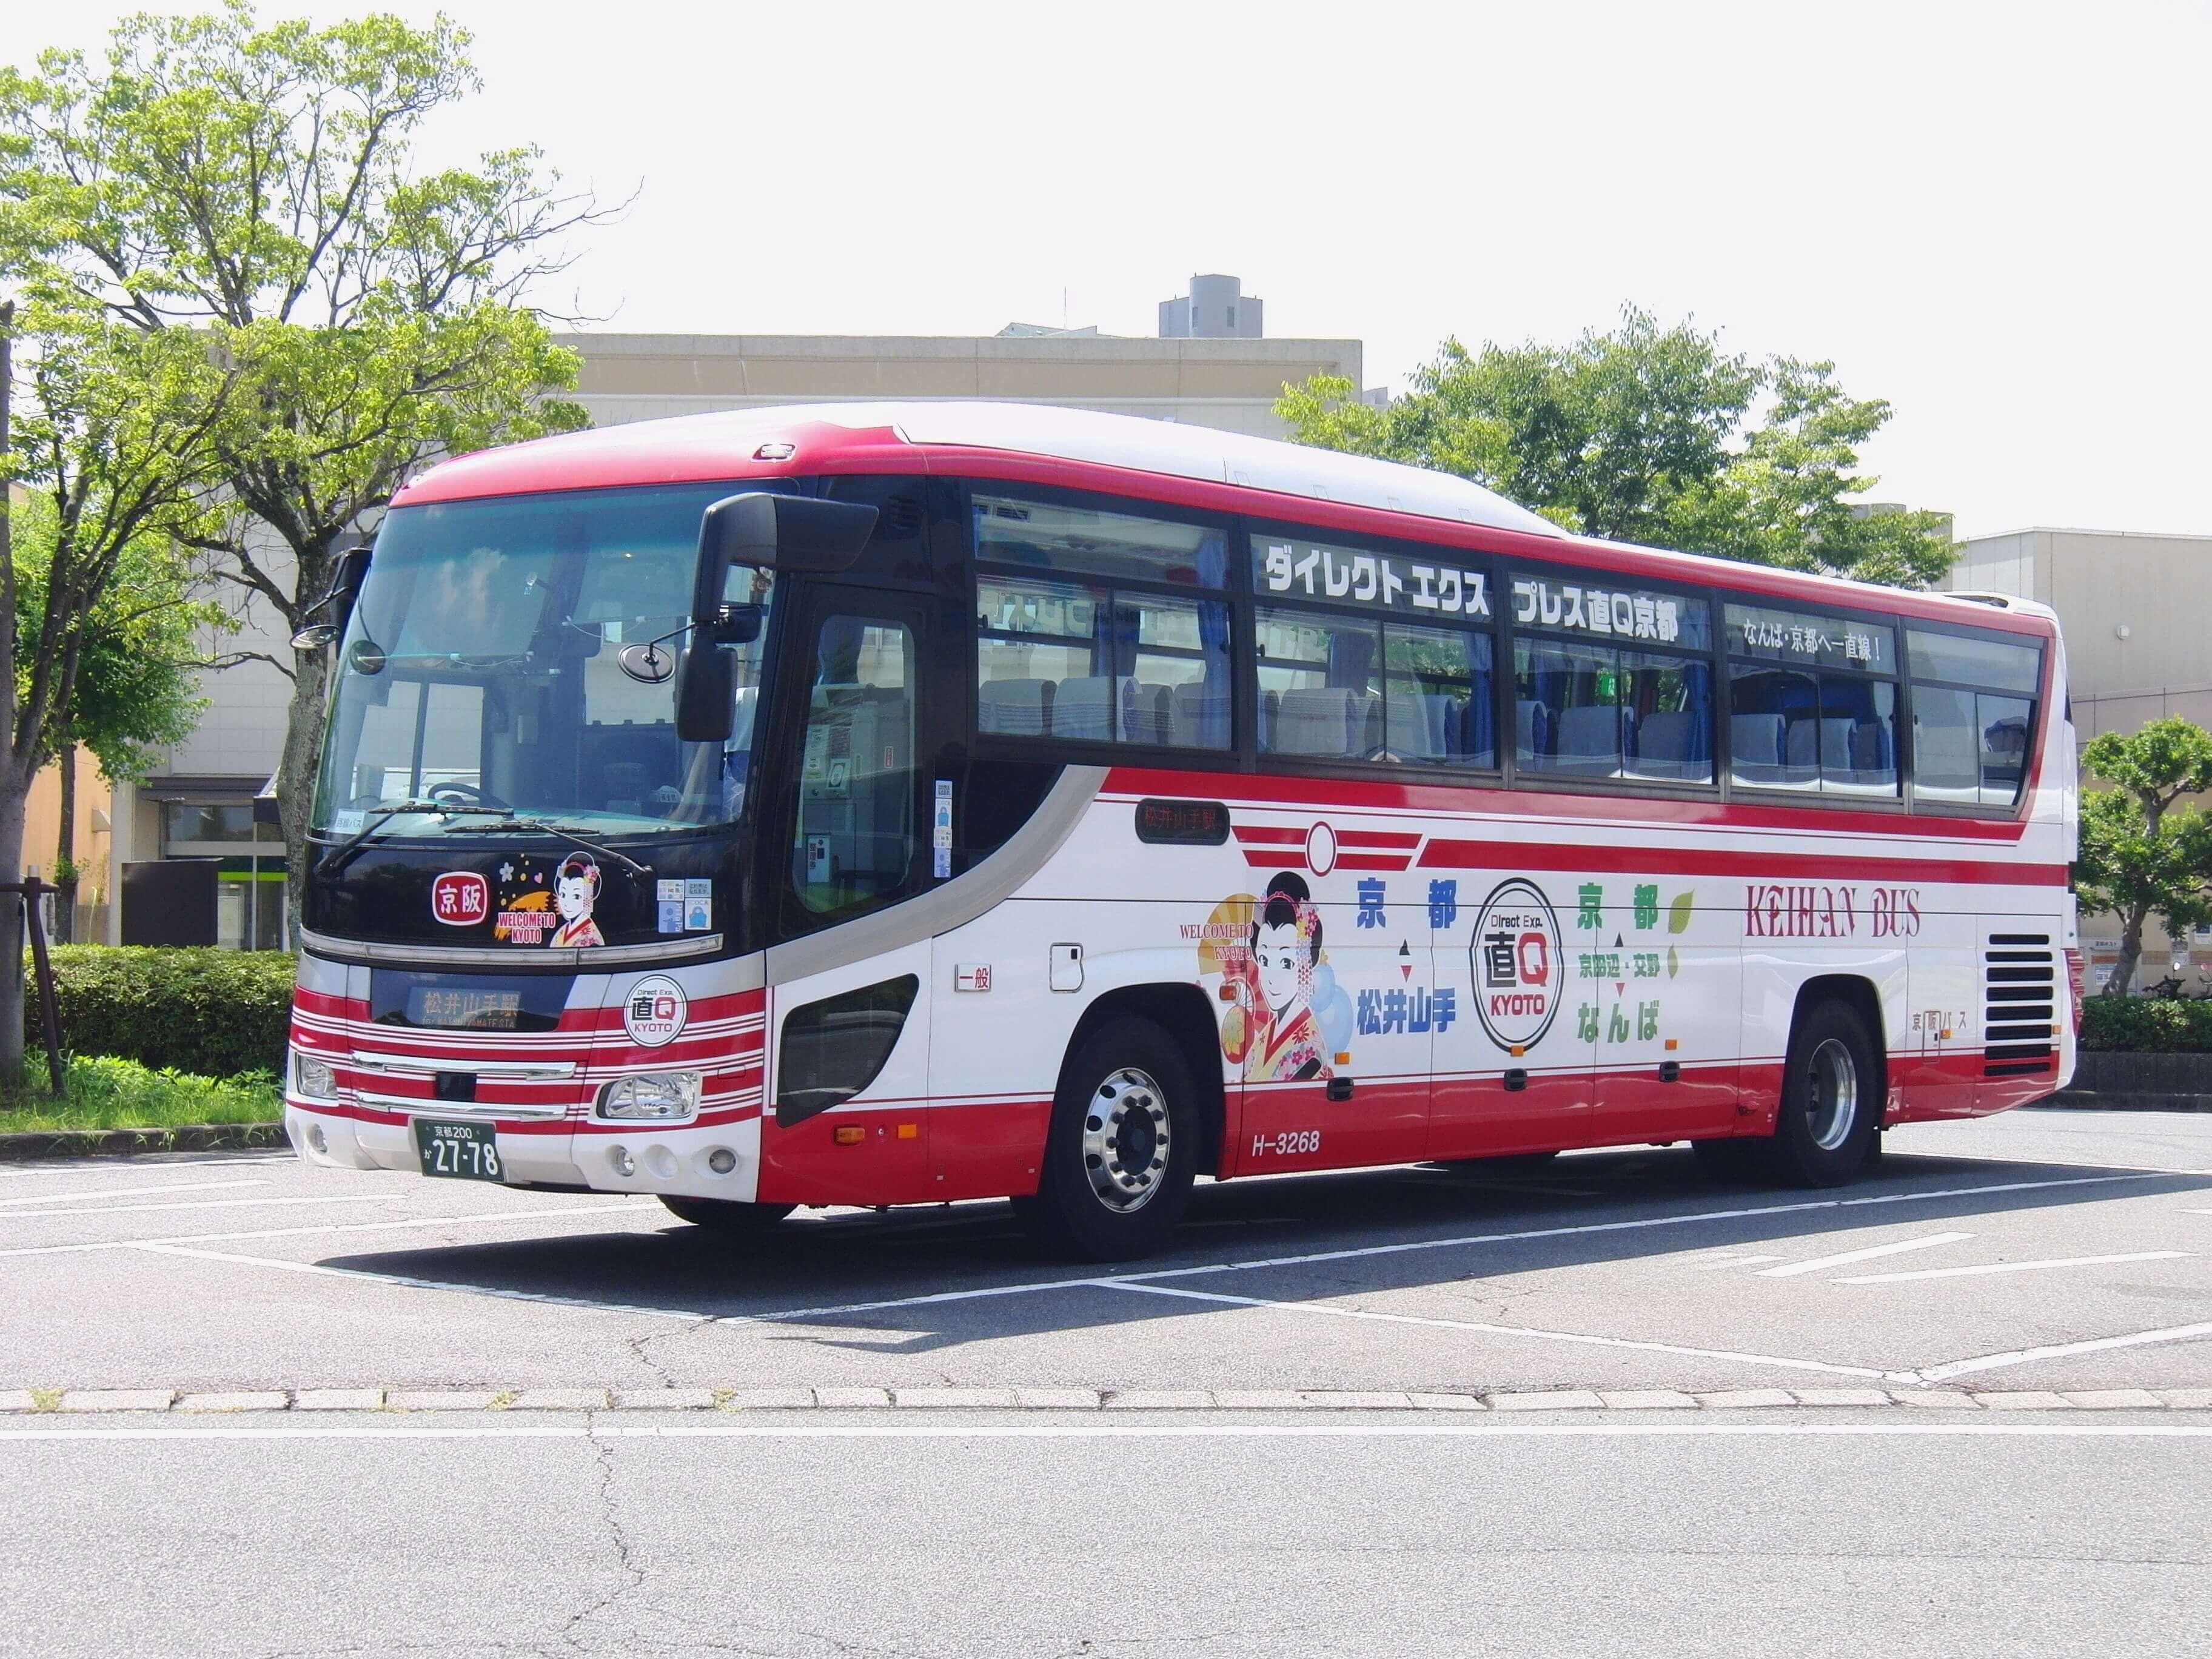 Universal Studios Japan Transportation from Kyoto